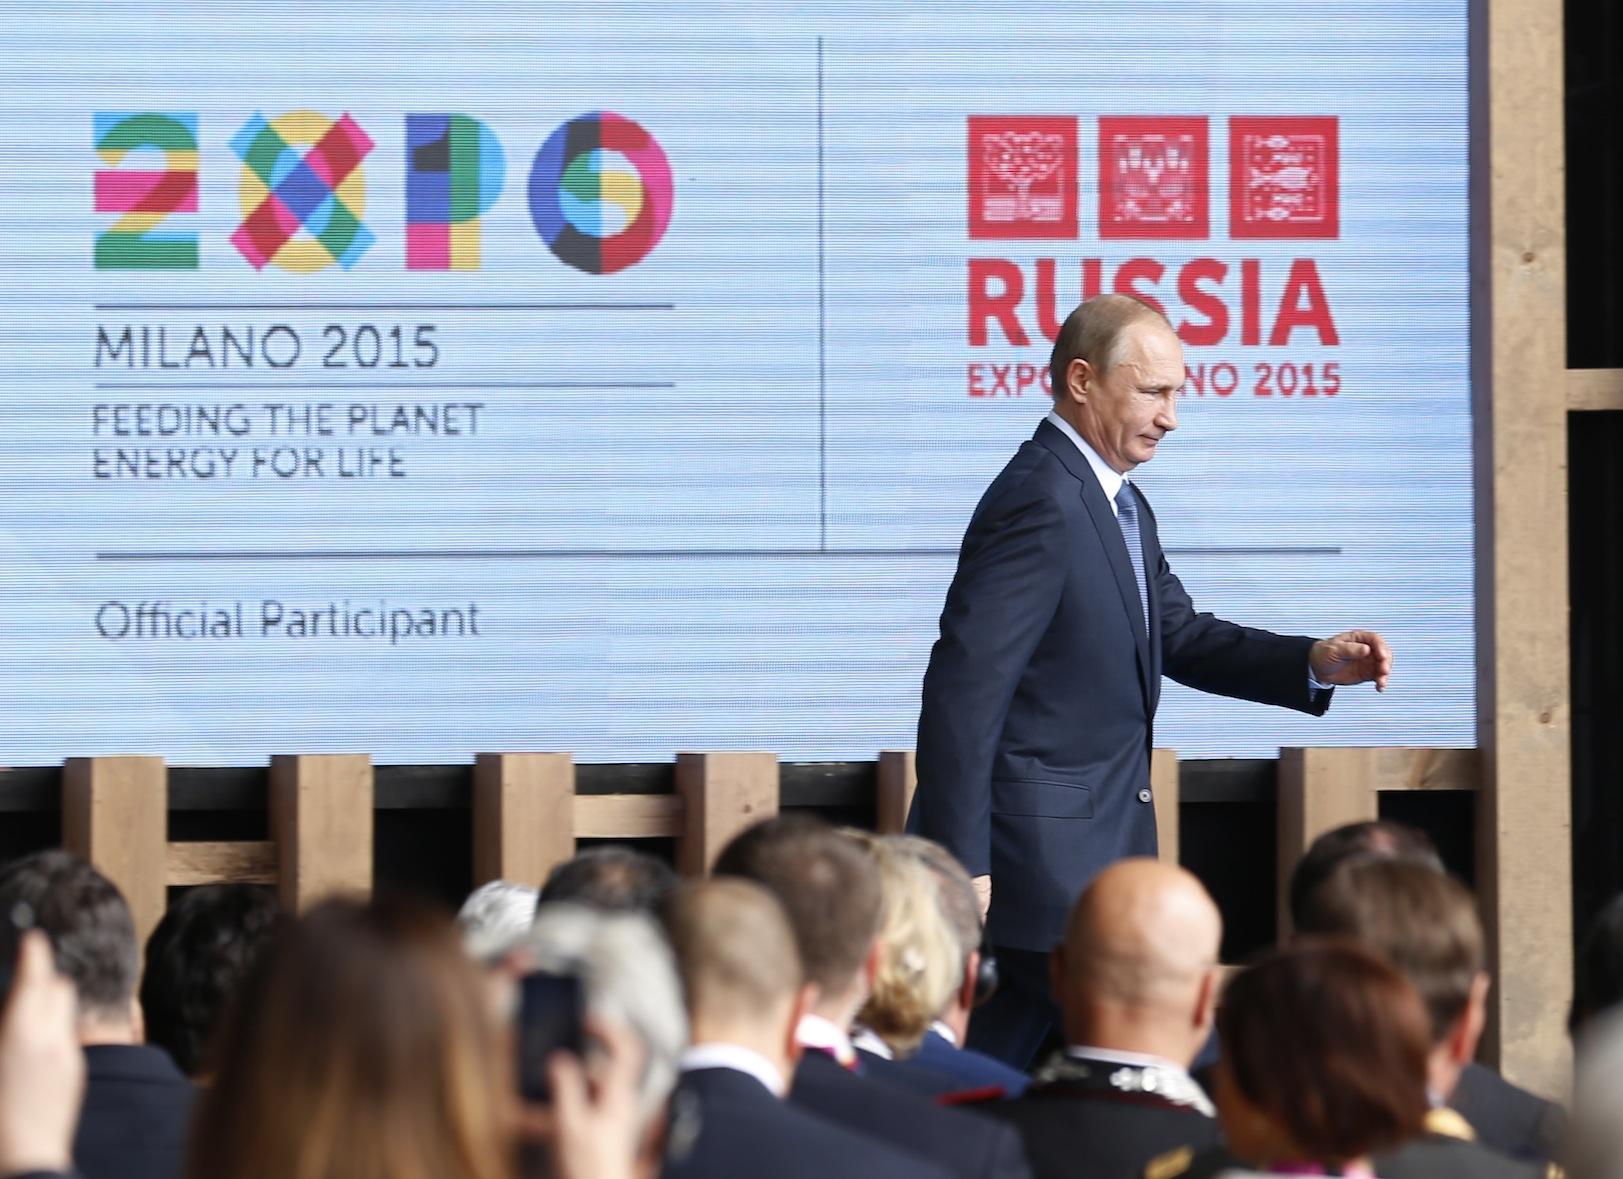 Putin all'Expo 2015